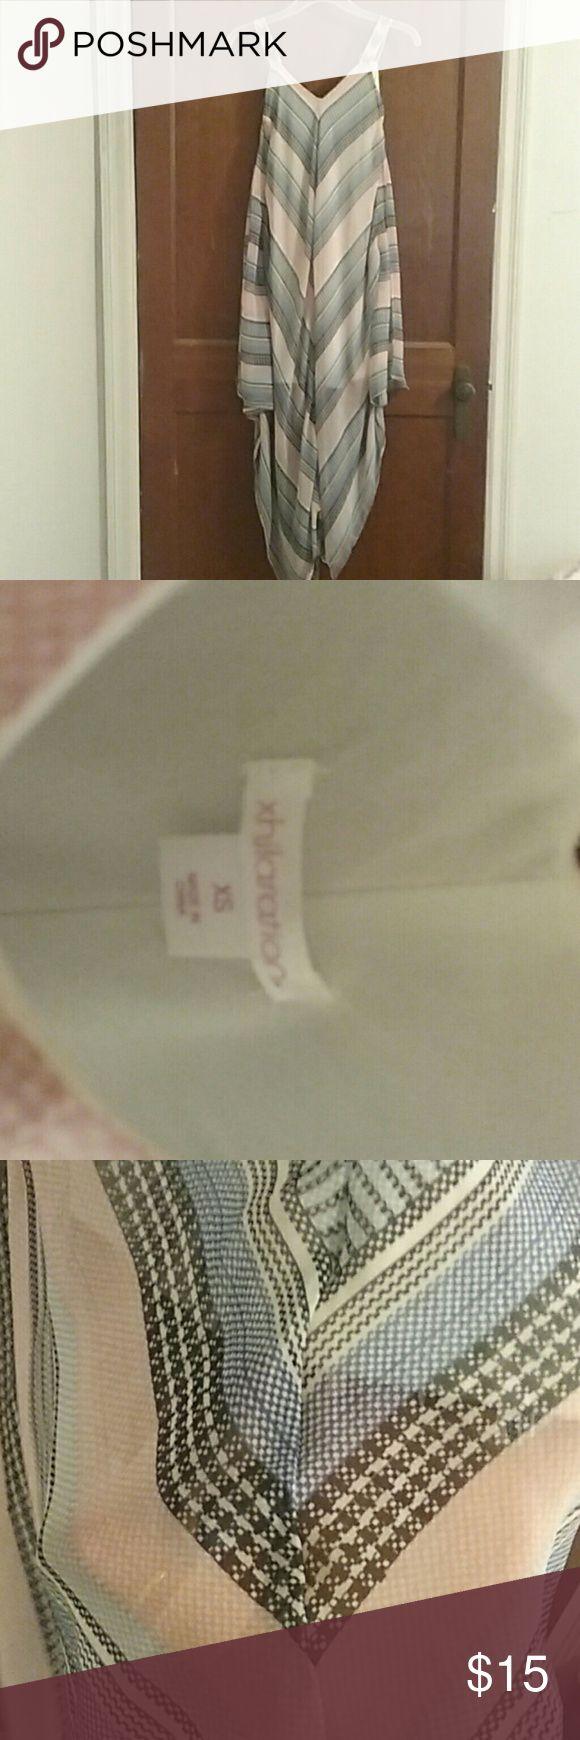 Lined handkerchief chevron print dress Falls slightly below the knee, soft pink, soft blue, black, white and dark blue alternating chevron pattern. Worn once, no frying, rips, or tears. Xhilaration Dresses Asymmetrical